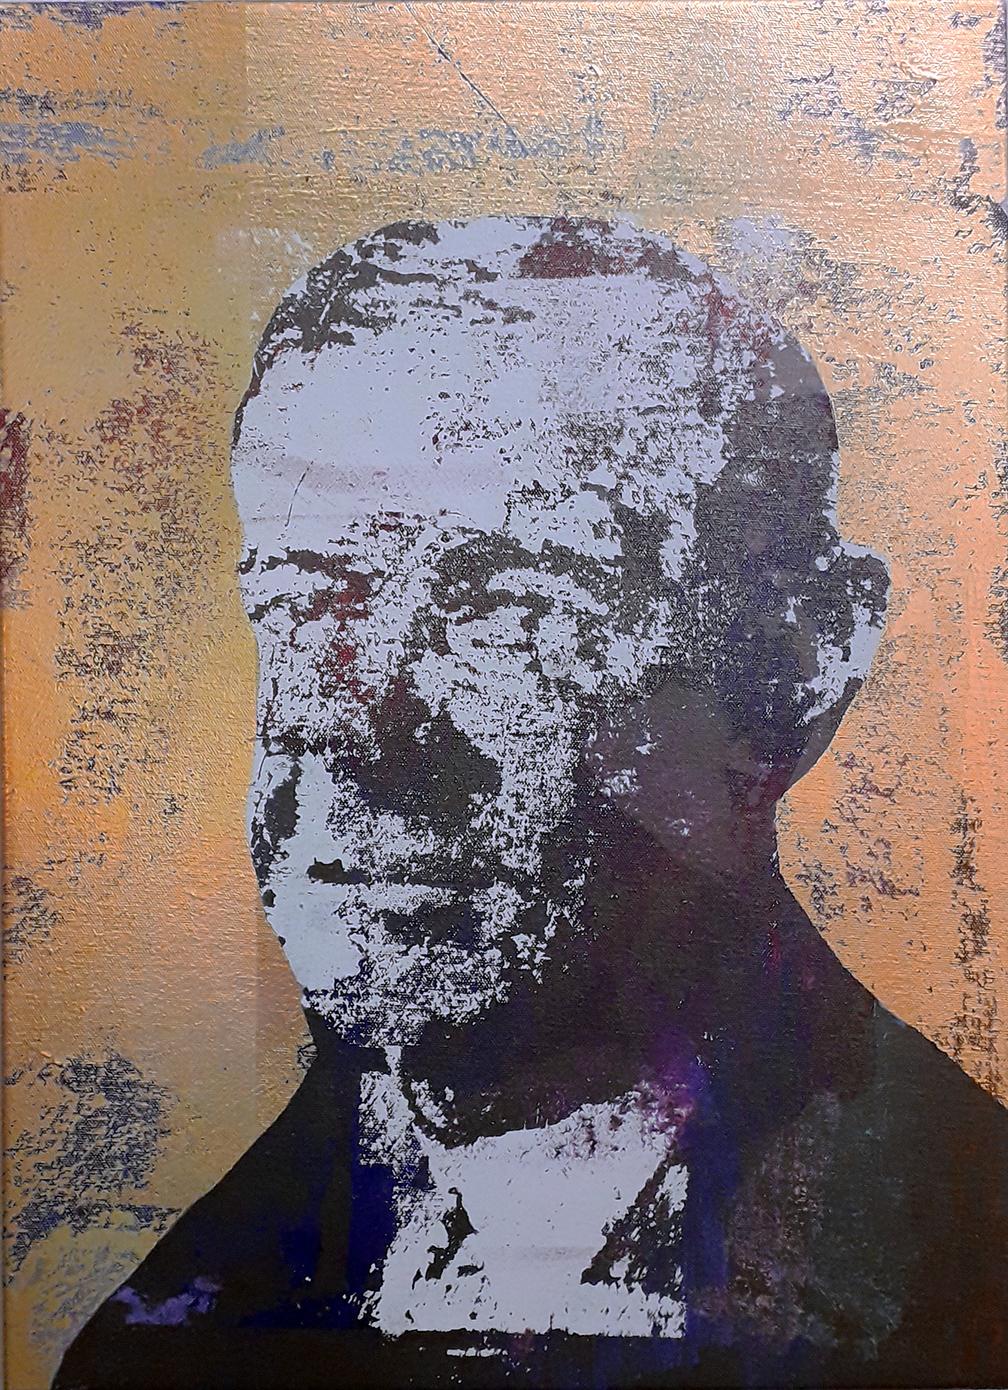 100,000 Woodrow Wilson 22 by 16, 2018